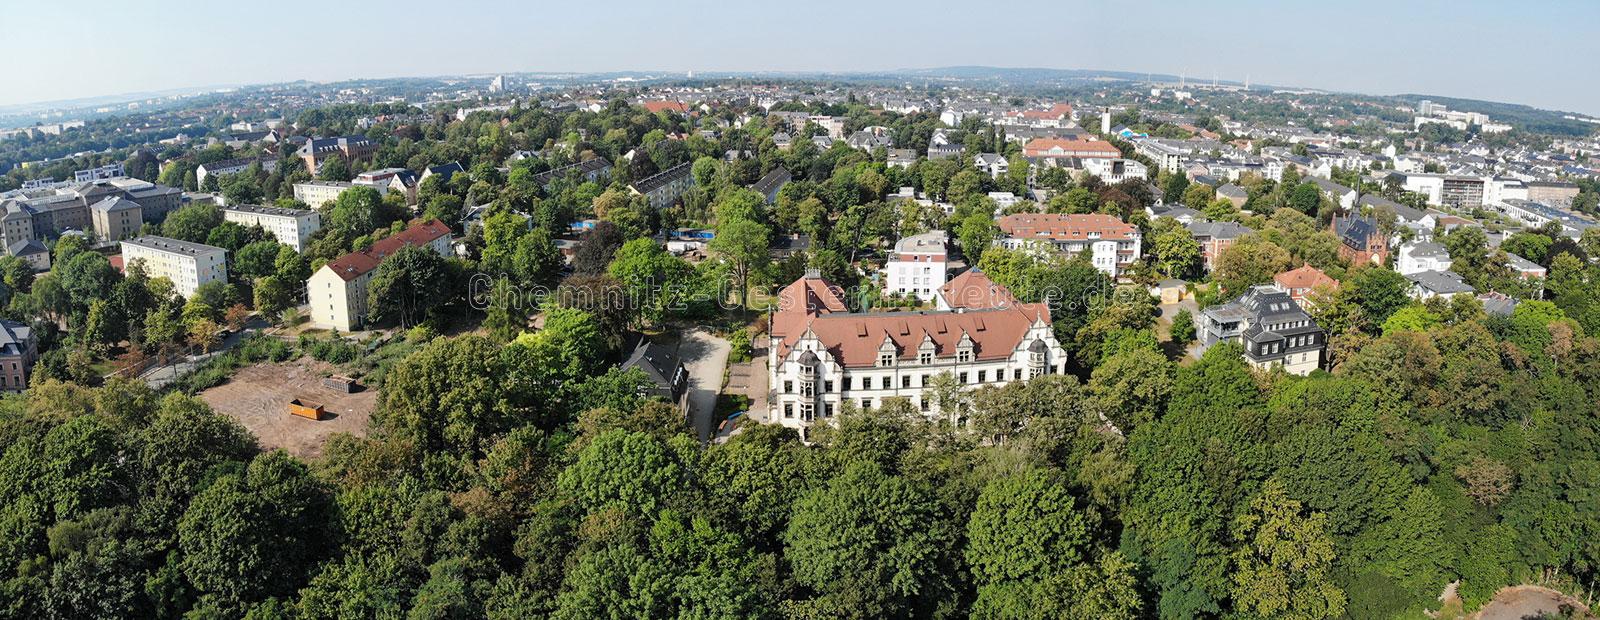 2018-08-19-Kassberg1-1600-620